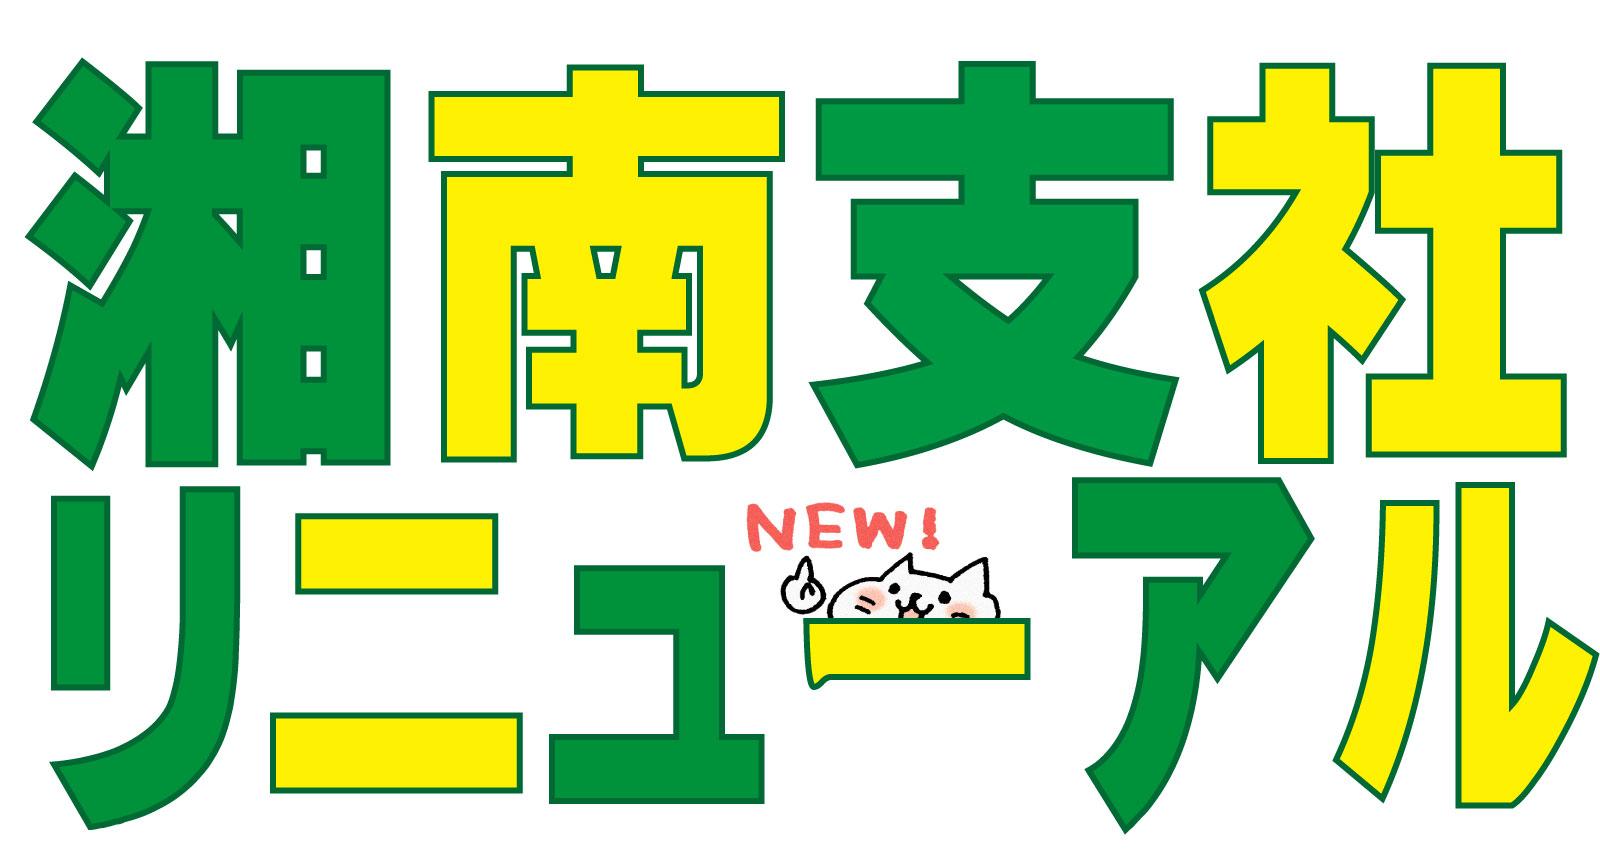 【警備】★湘南支社★業務多忙・拡大の為、緊急募集★工事現場での交通誘導